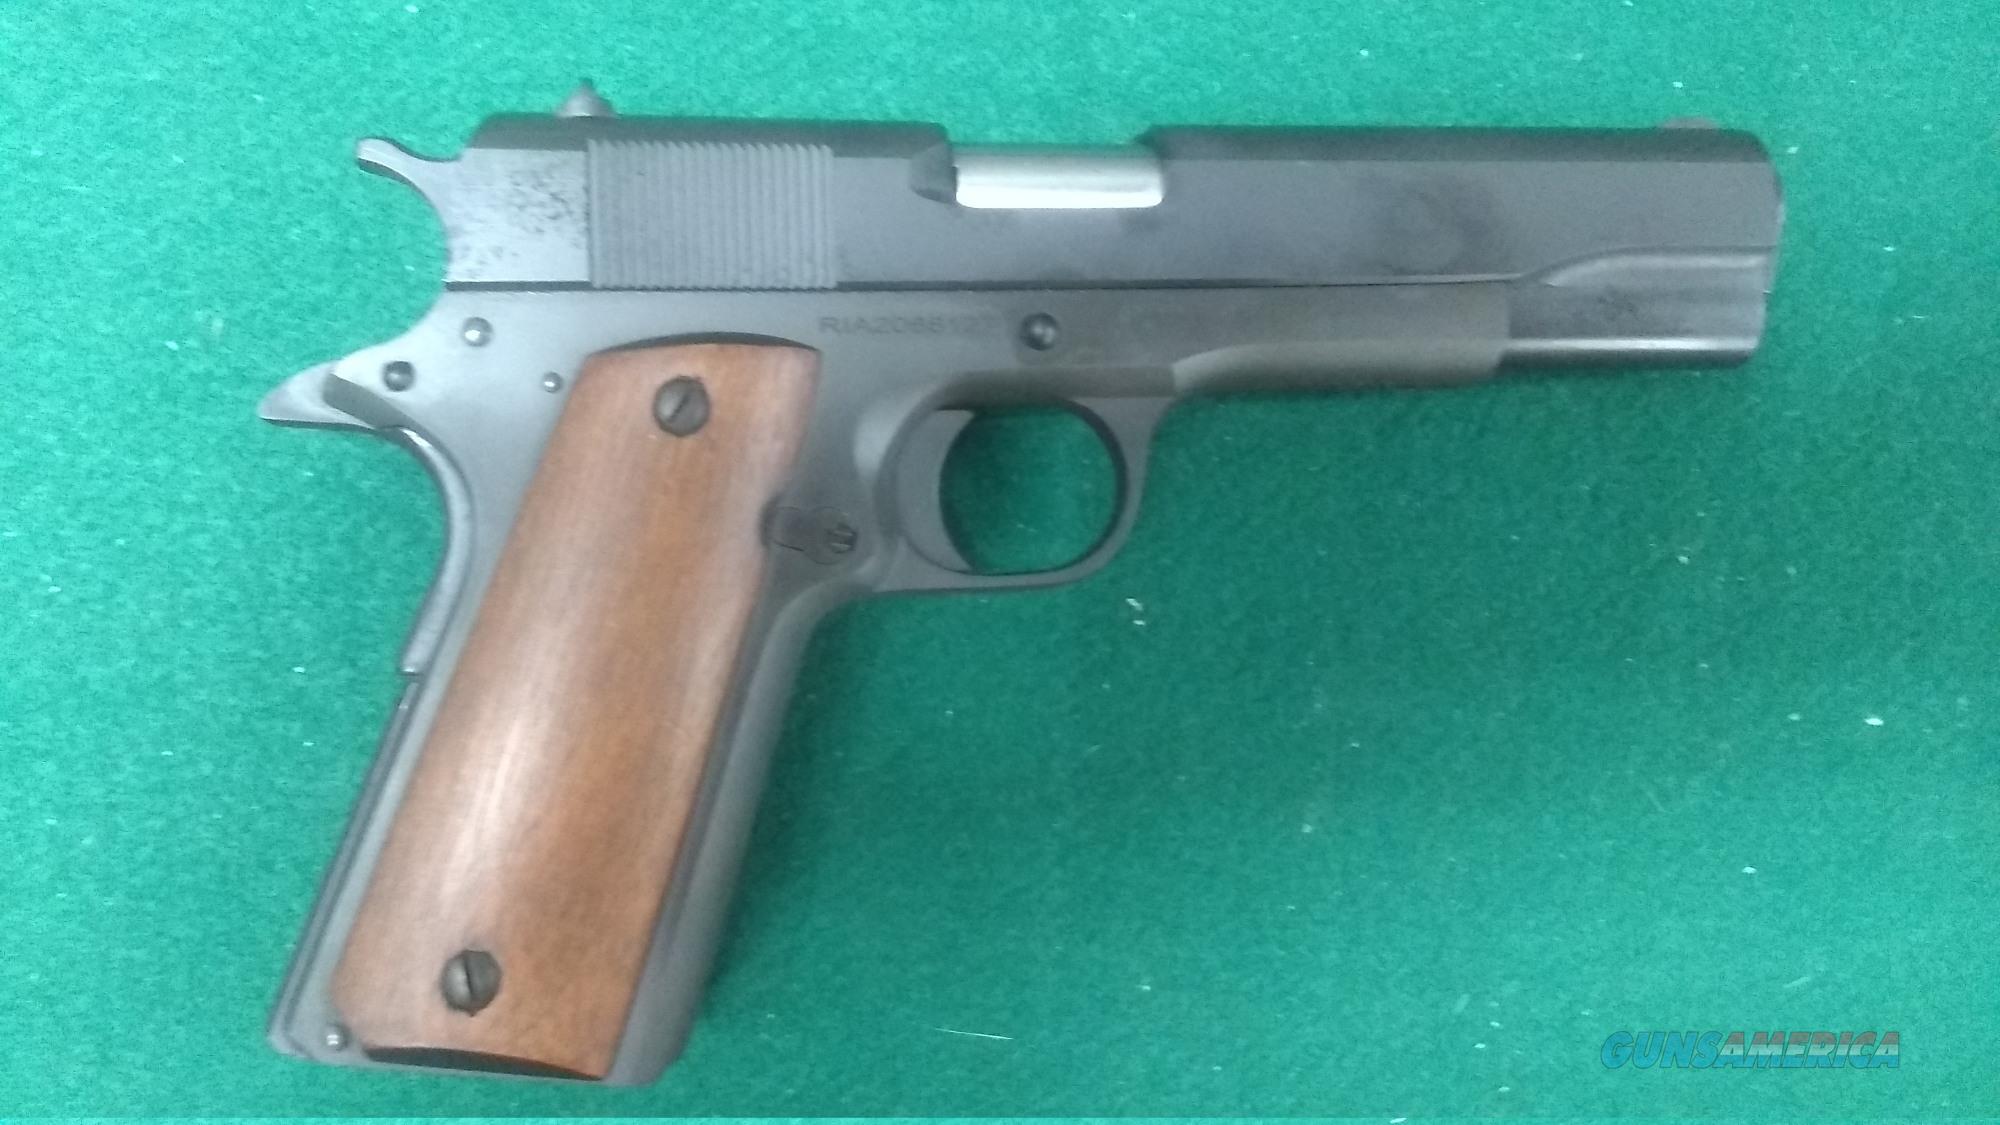 Rock Island Armory GI Series 1911 Semi Auto Pistol 38 Super  Guns > Pistols > Rock Island Armory Pistols > Rock Island